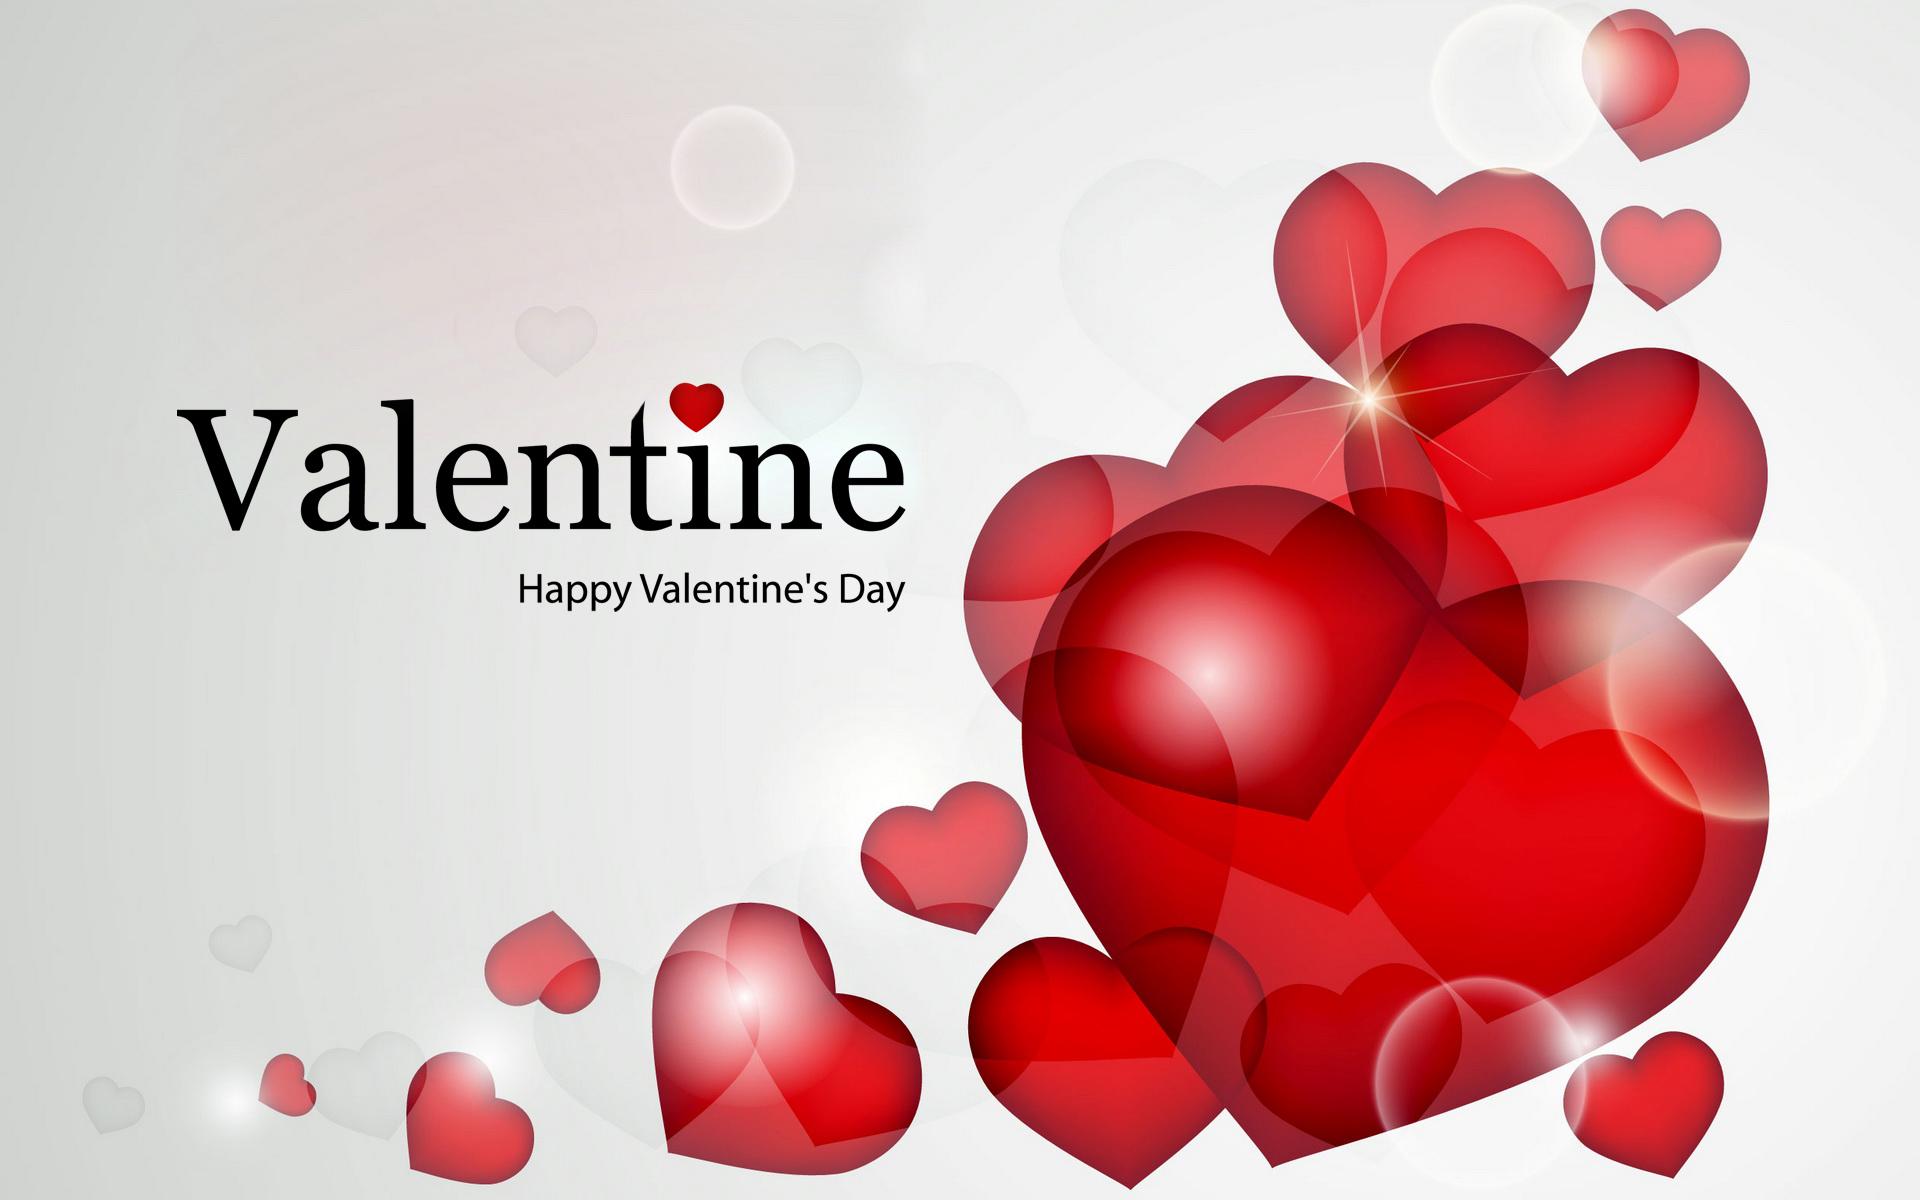 happy valentine's day wallpapers hd   pixelstalk